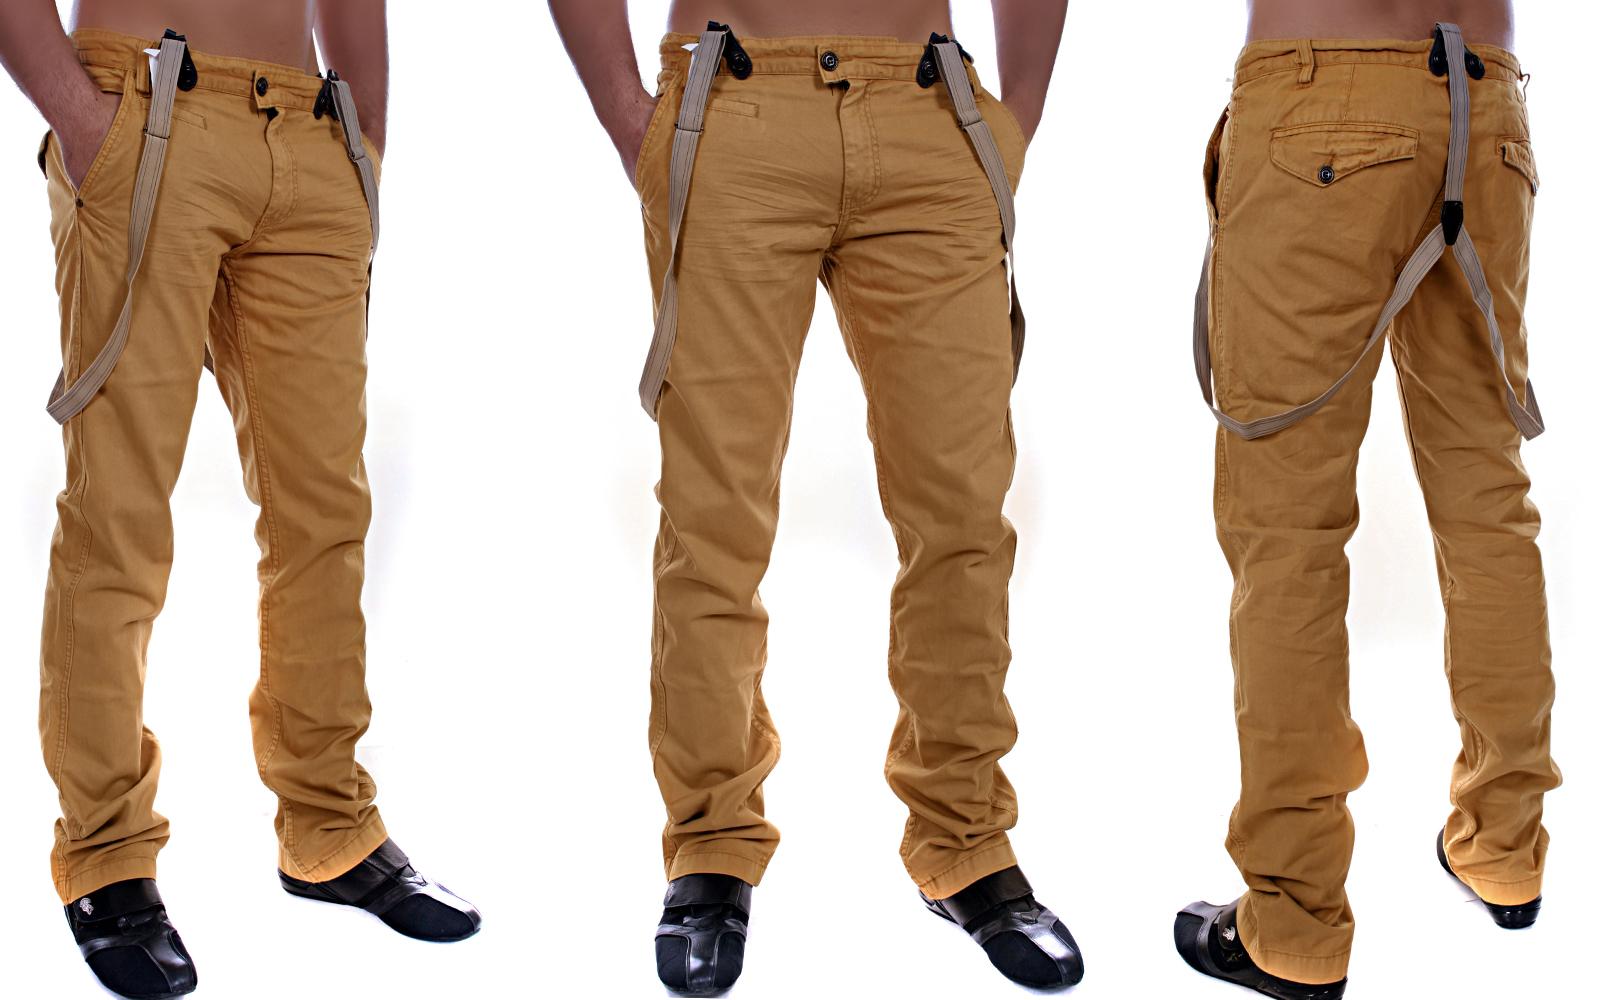 31 W29 33 34 Herren 32 Hose 30 Chino Hosenträger Trousers Jeans E9HDI2